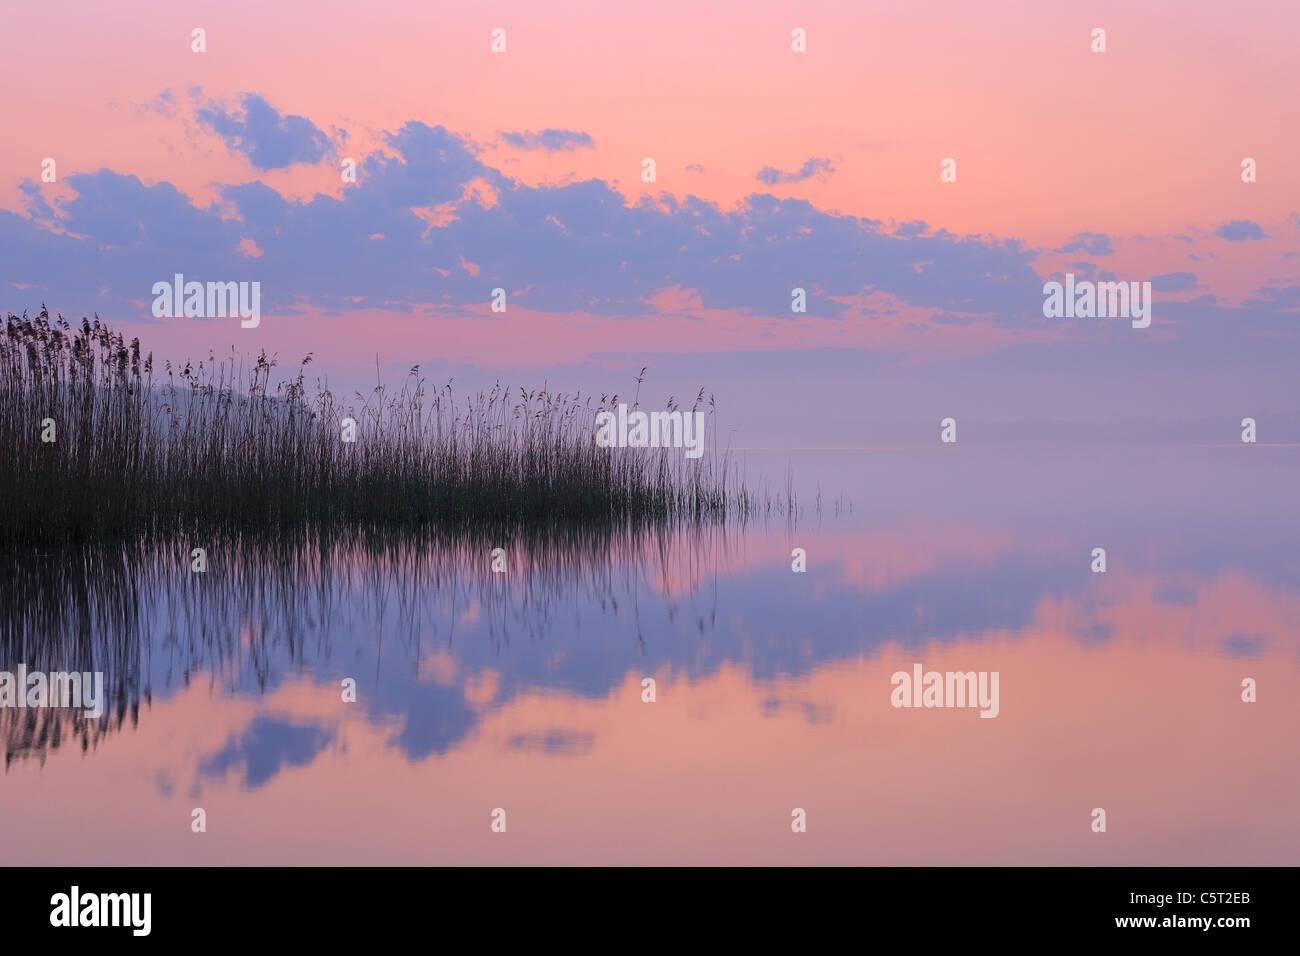 Germany, Mecklenburg-Vorpommern, Mecklenburger Seenplatte, Plau am See, View of sunrise with reeds and reflection - Stock Image